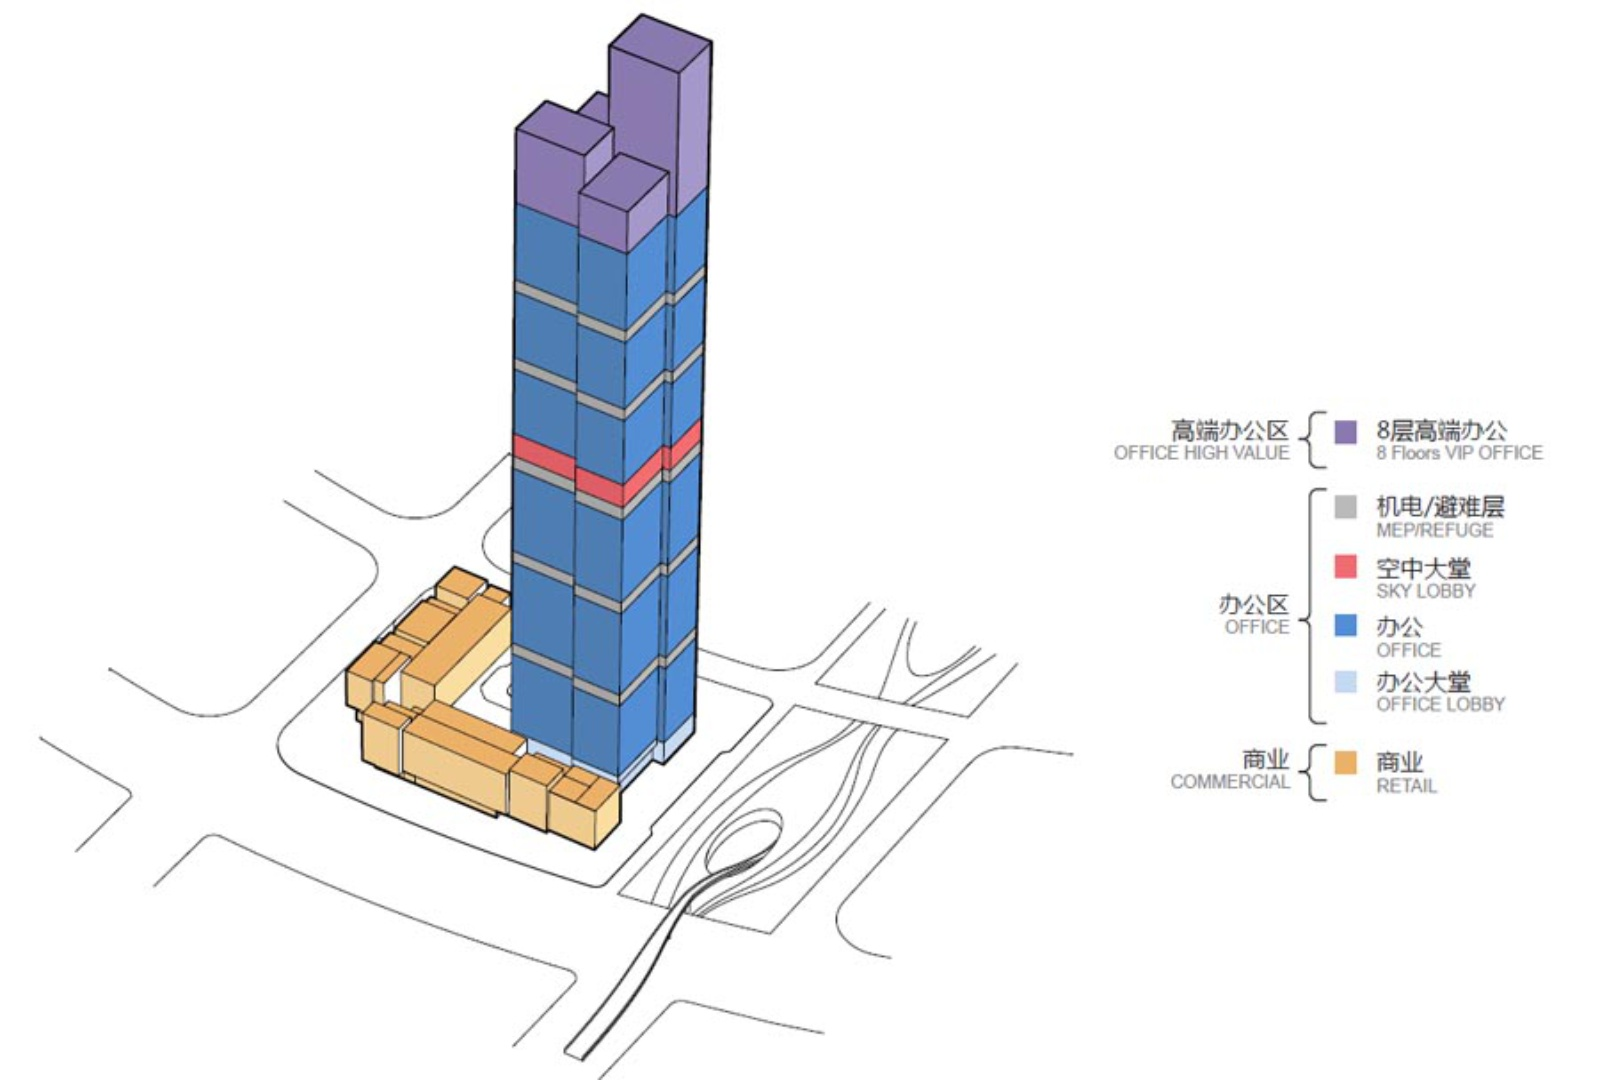 Jinmao Tower